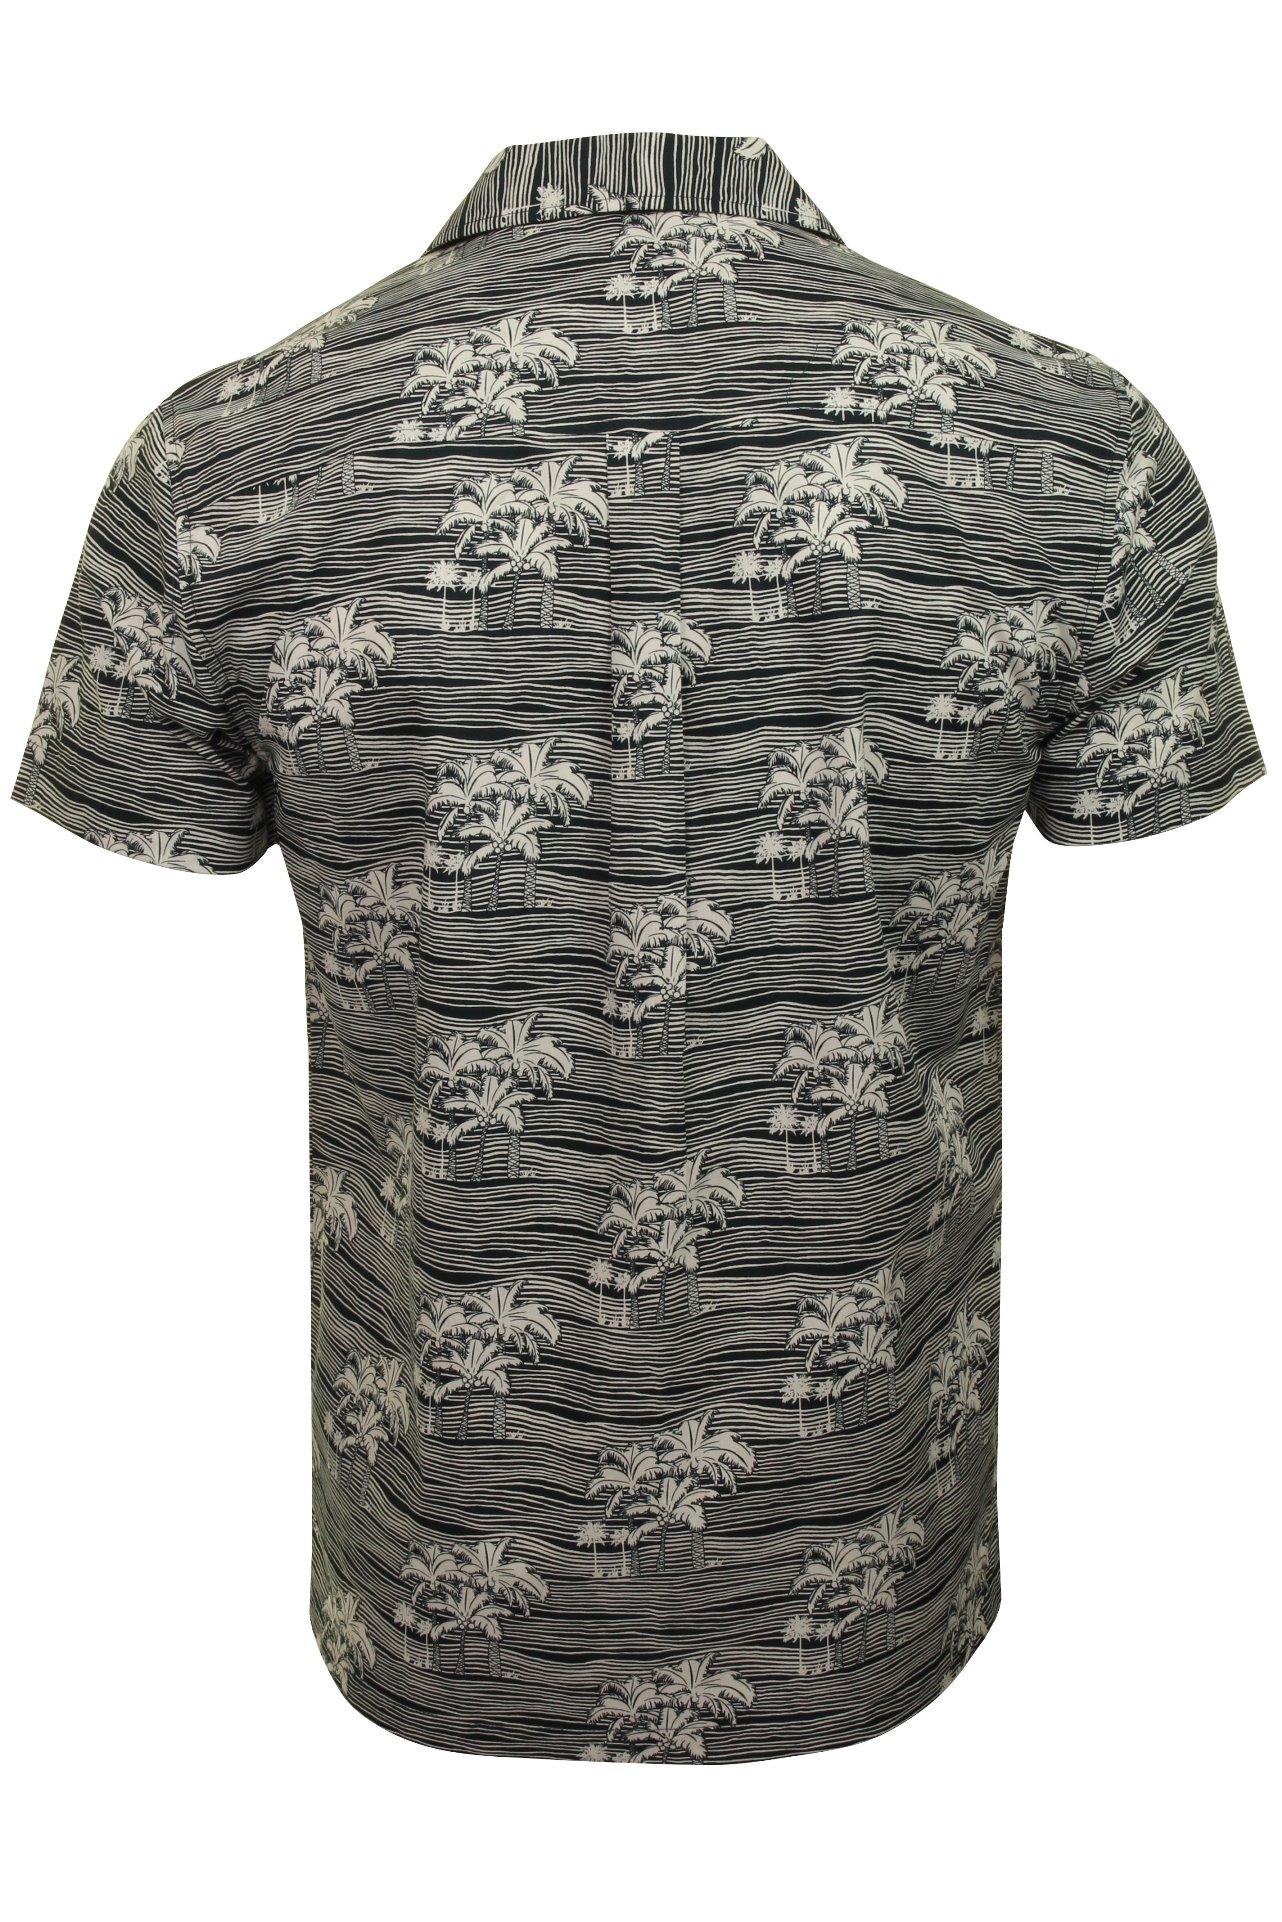 Xact Camicie Uomo Hawaiian Holiday a maniche corte